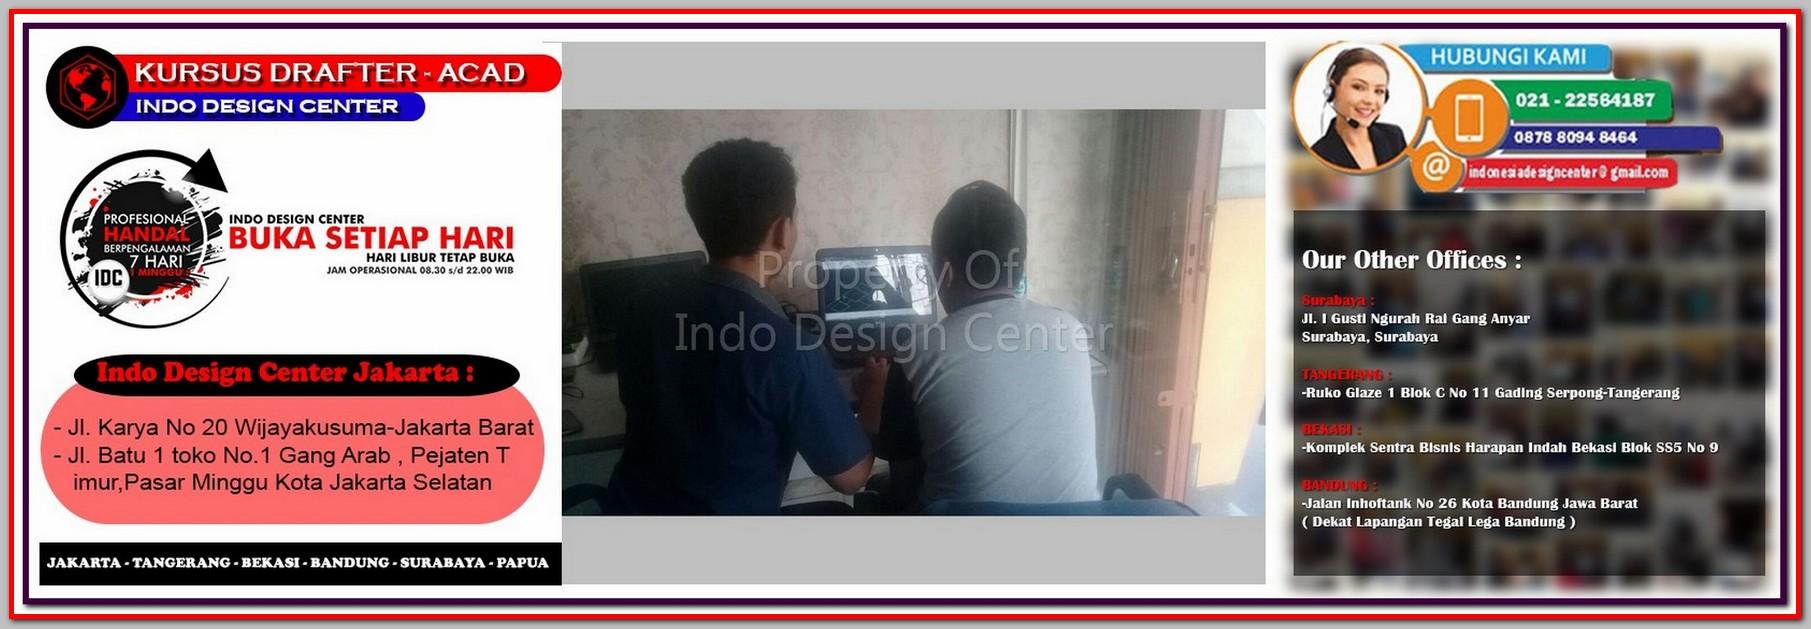 Kursus Modeling Sketchup Di Menteng - Jakarta - Tangerang - Bekasi - Bandung - Surabaya